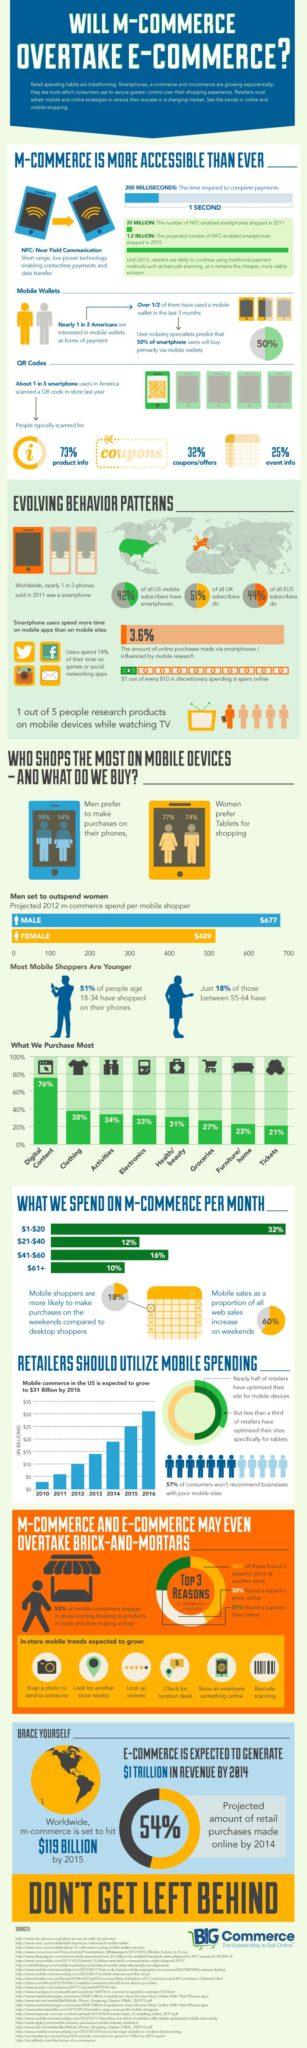 Will M-commerce overtake E-commerce?